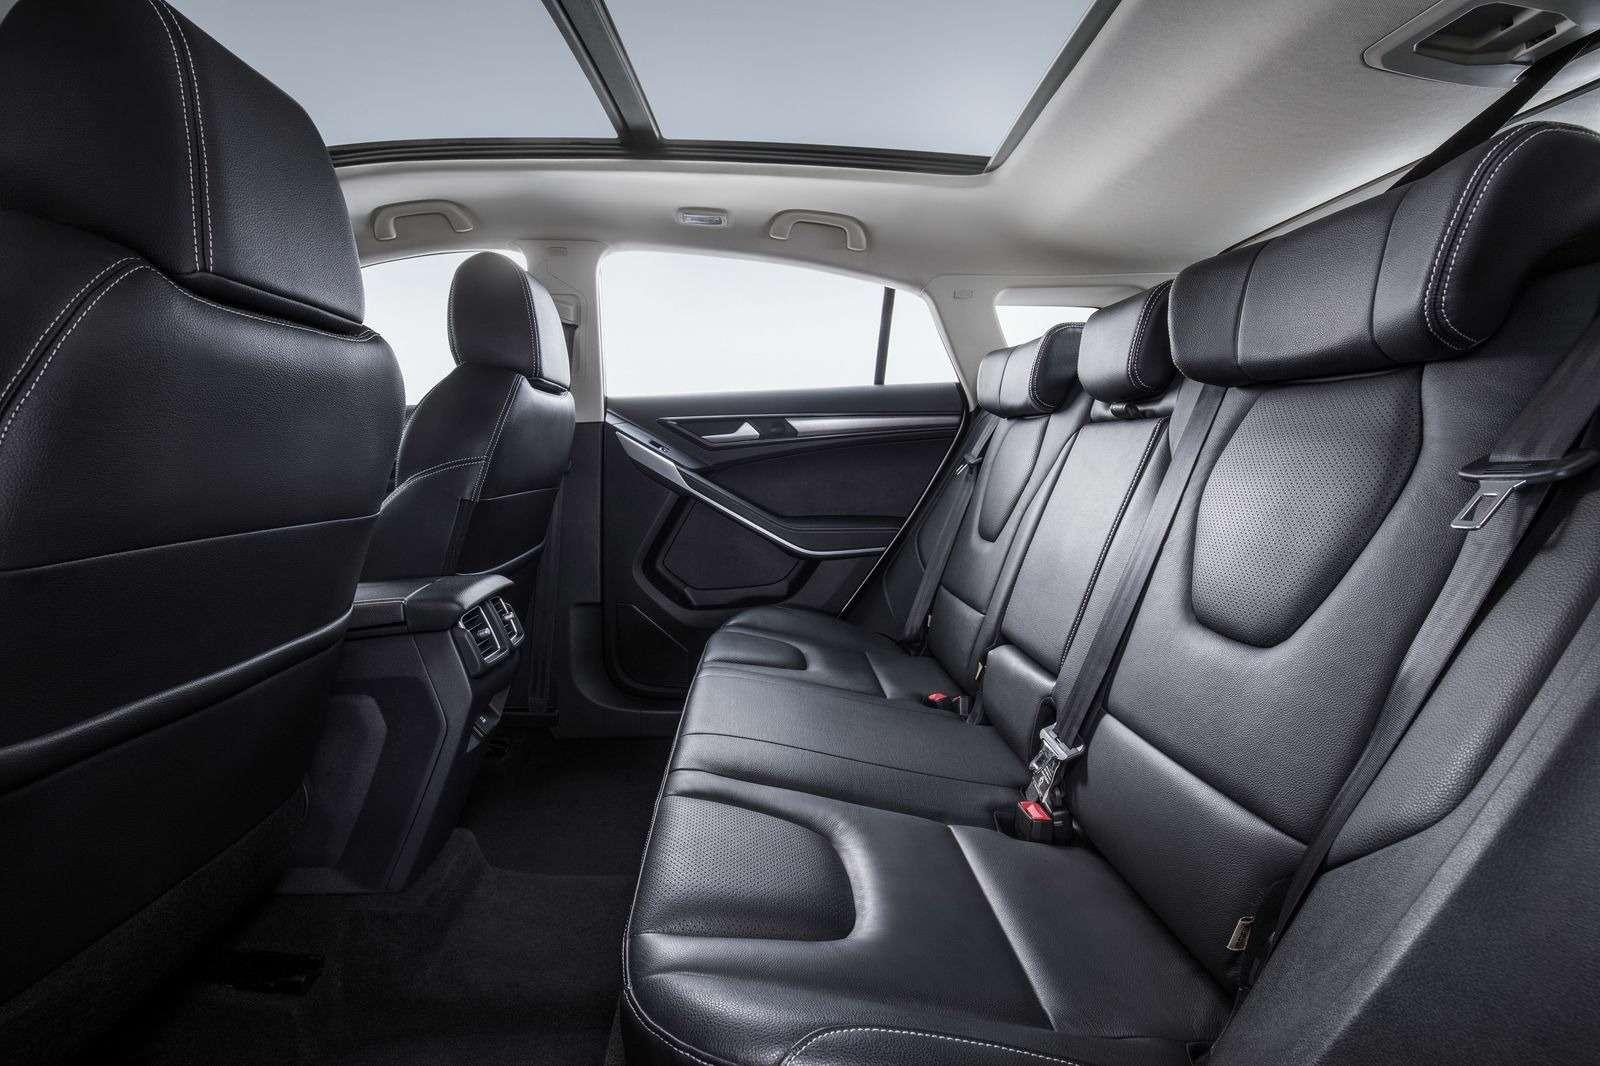 Ford представил новый бюджетный кроссовер Territory— фото 893974